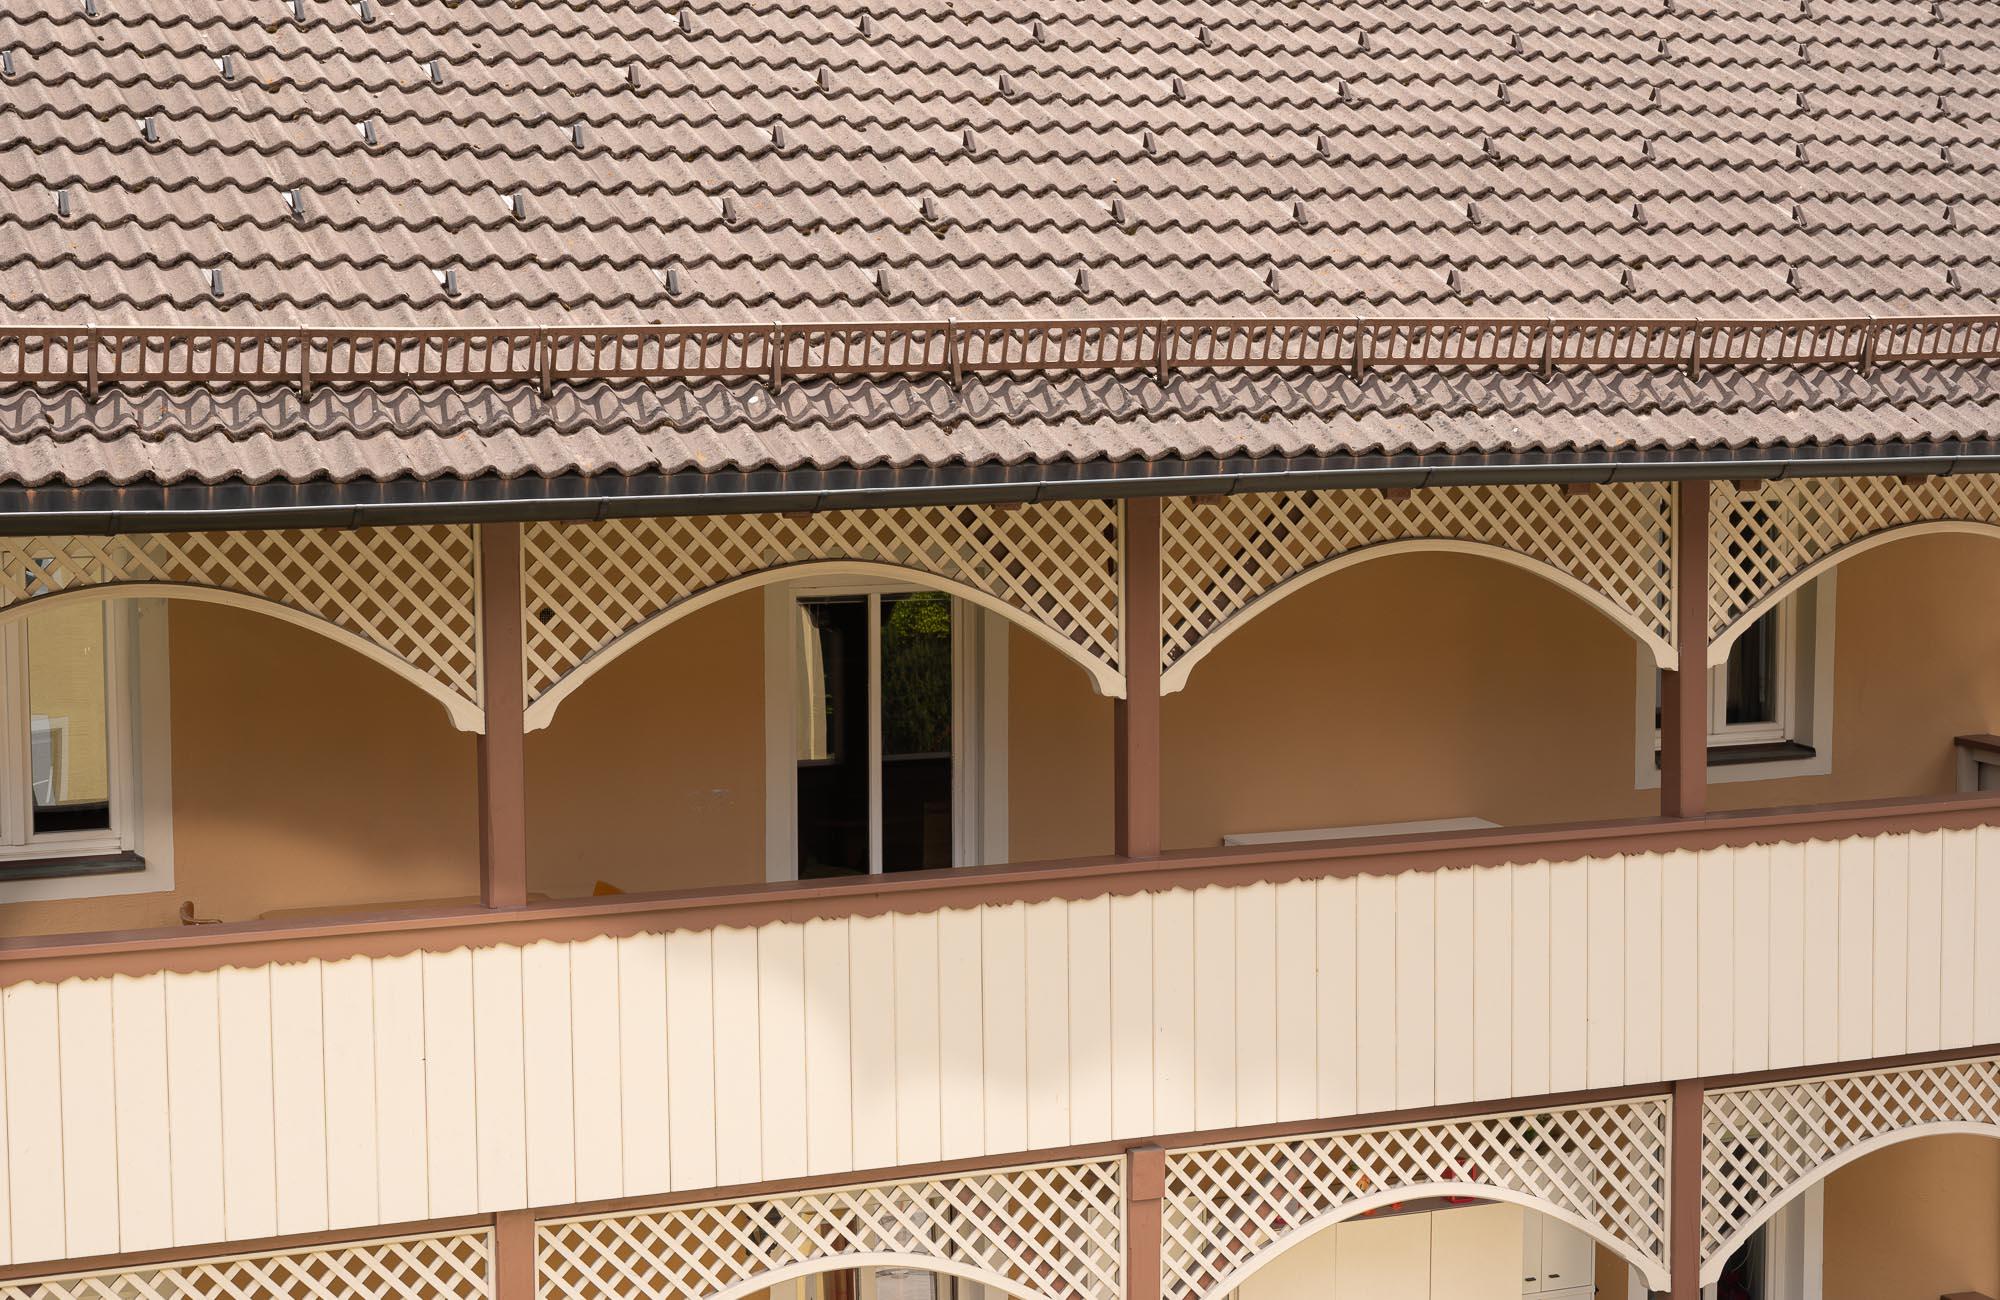 Absteige Innsbruck, Sommerurlaub, Balkon